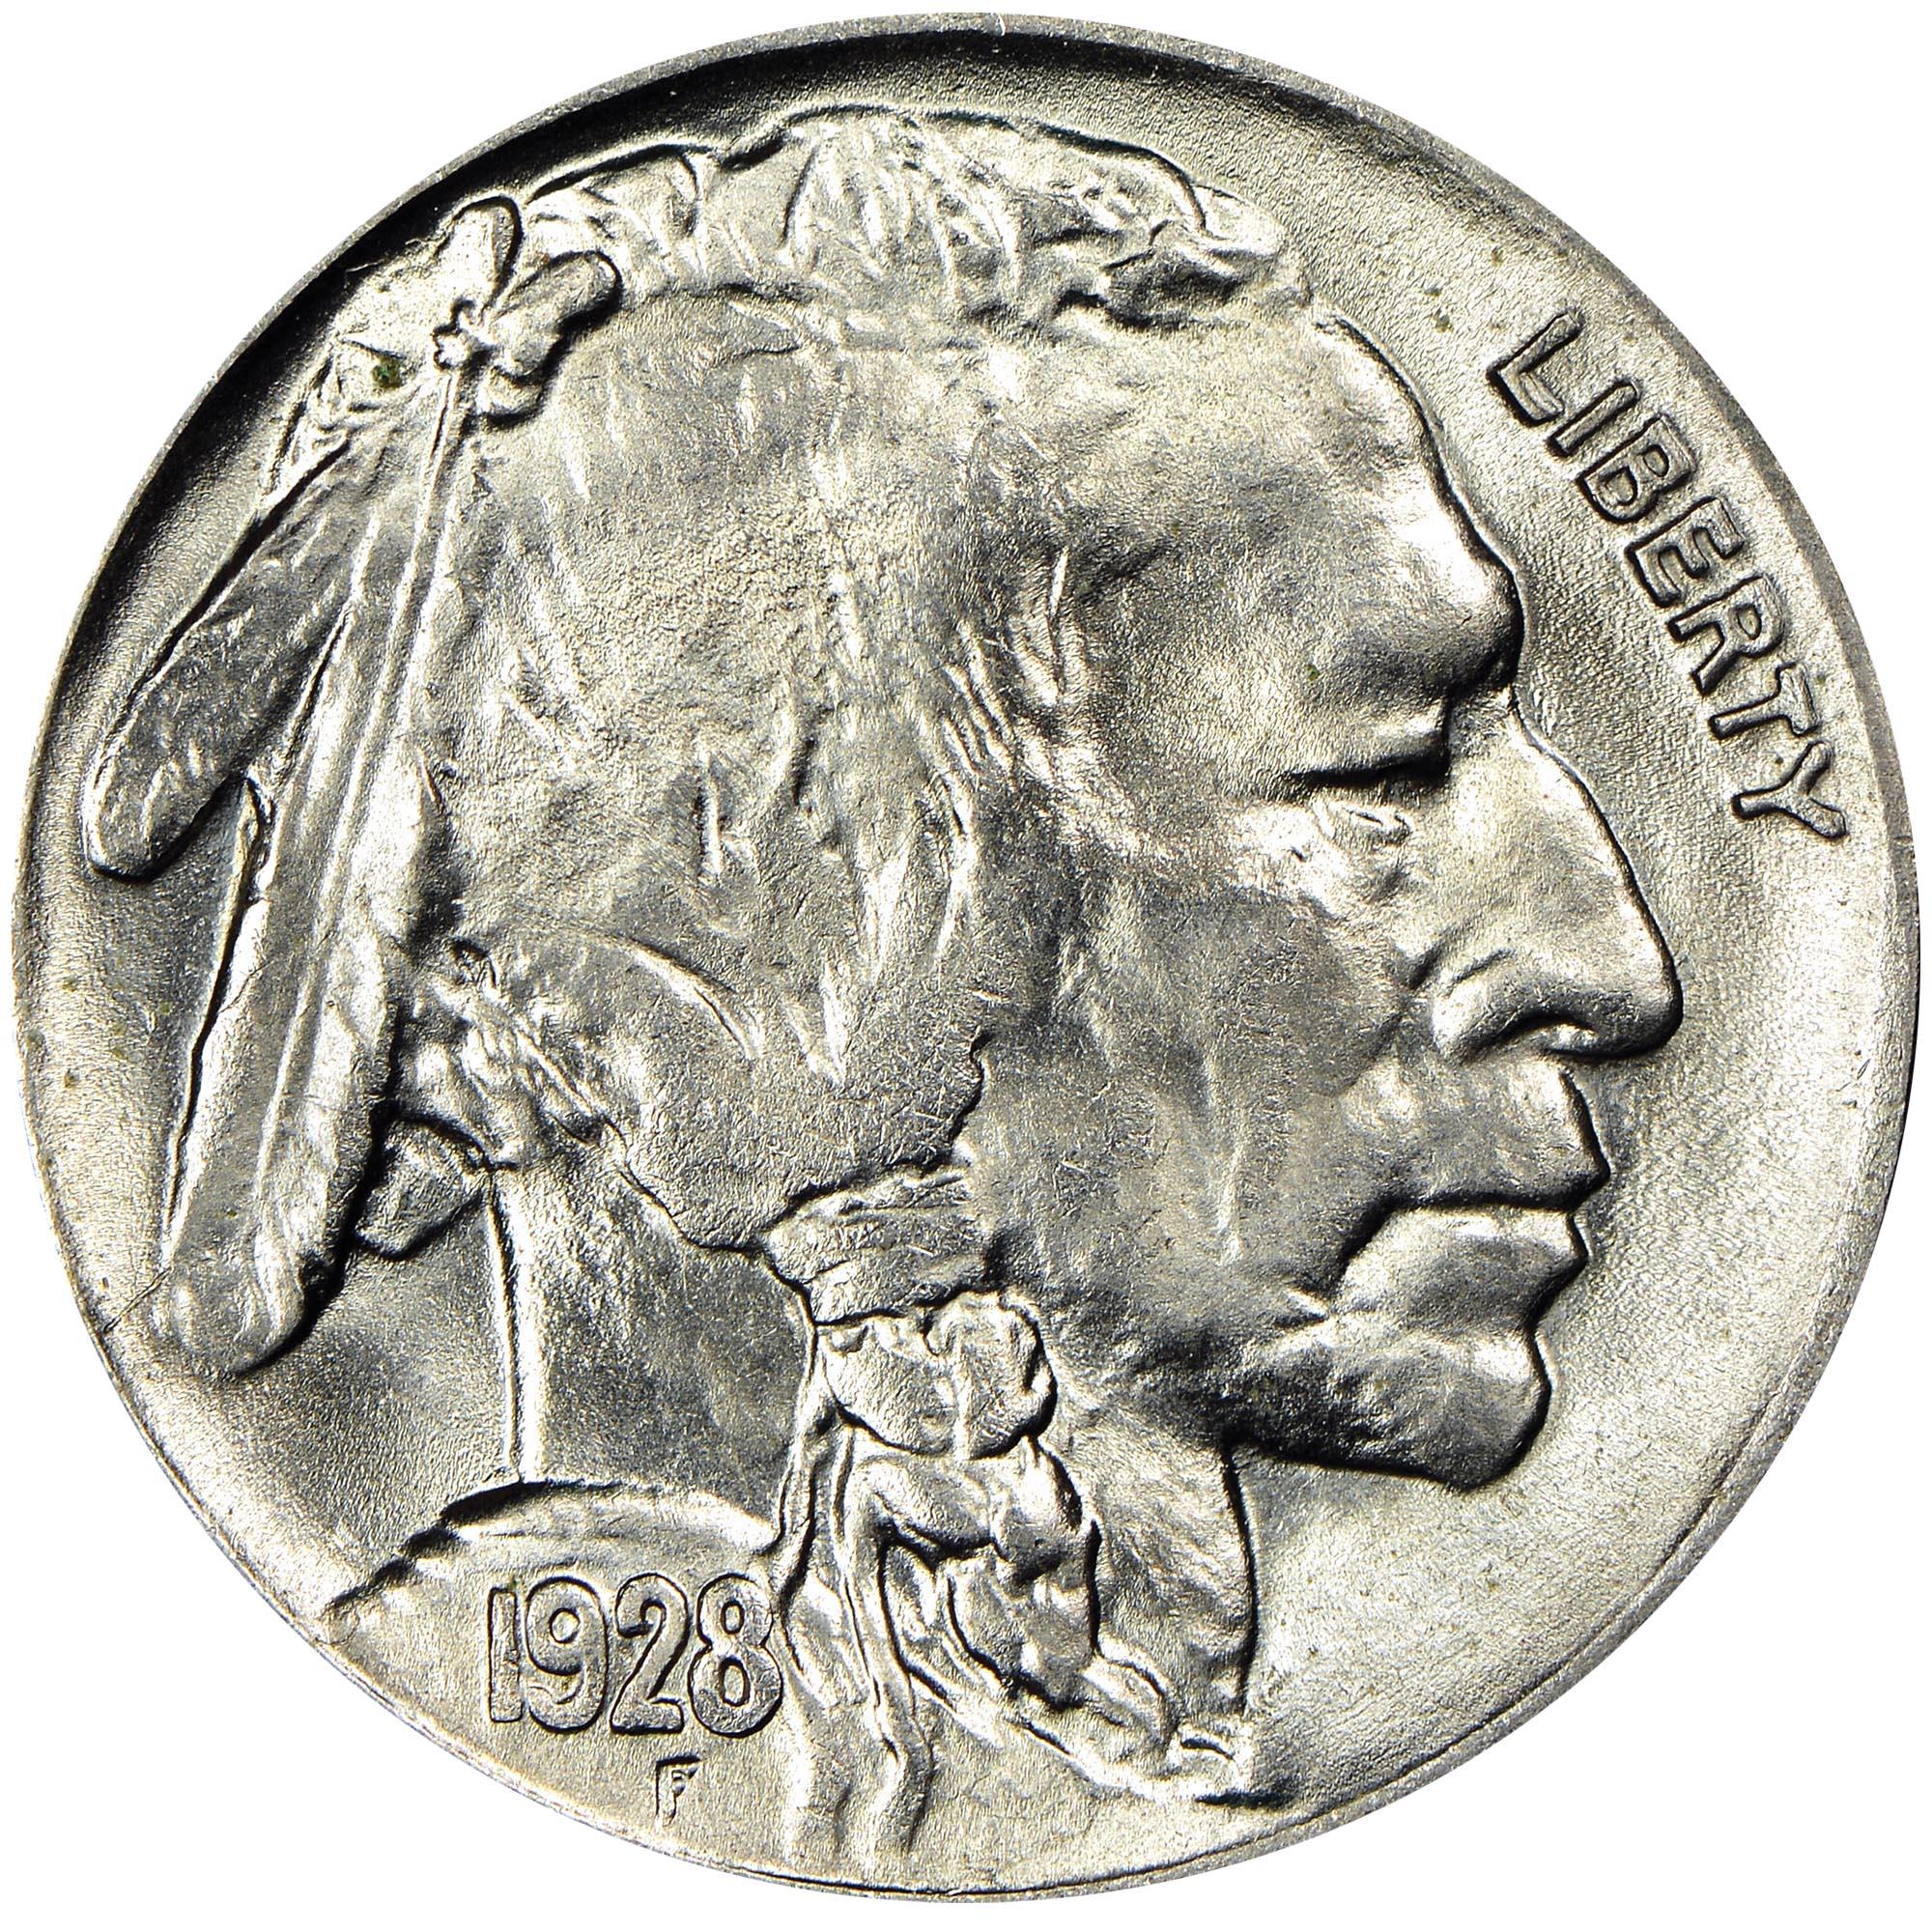 1928 5C MS Buffalo Five Cents | NGC